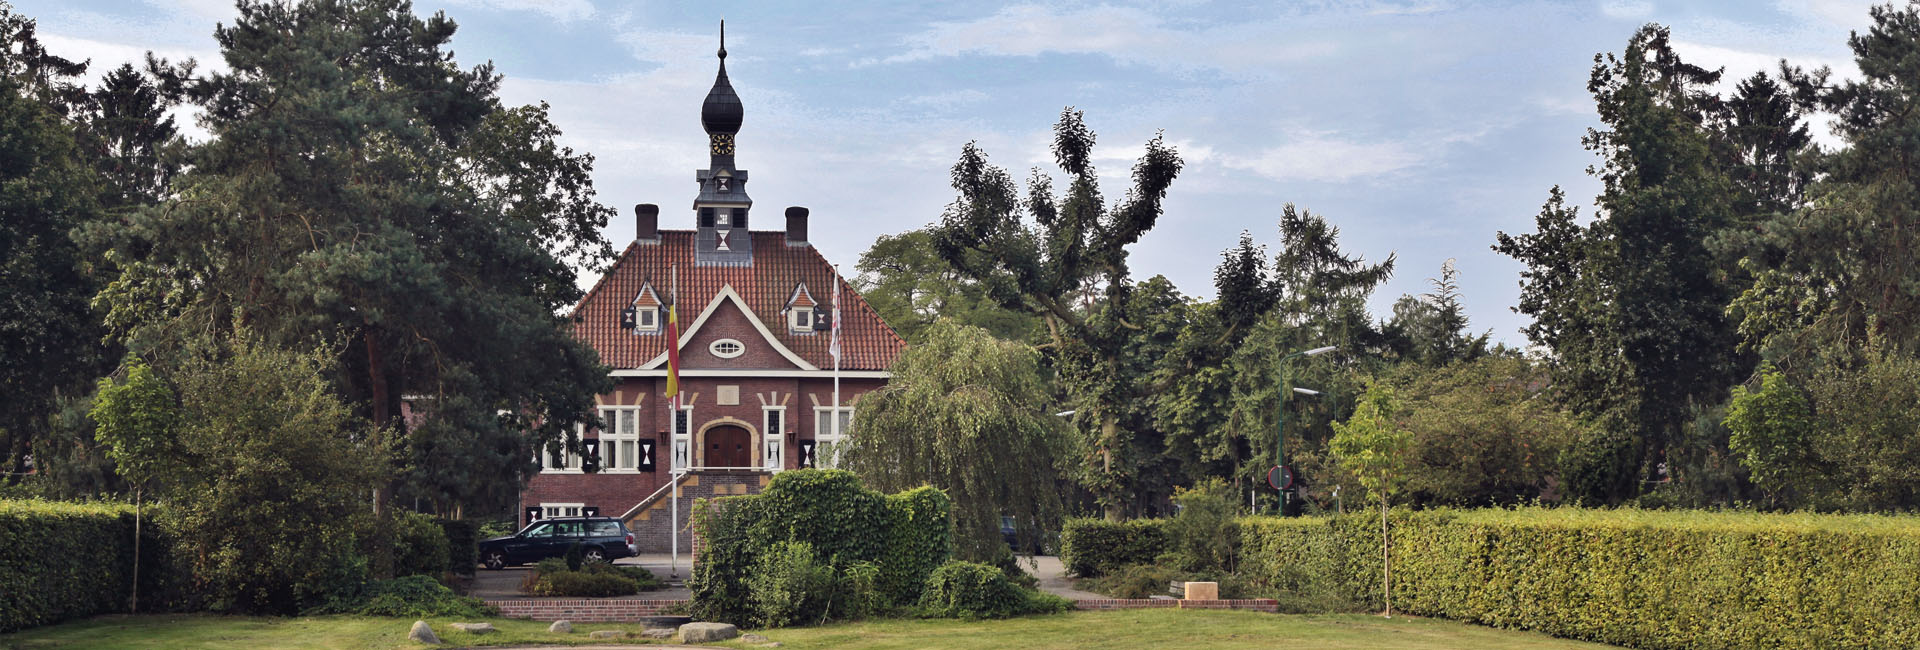 't Oude Raadhuis in Maarn